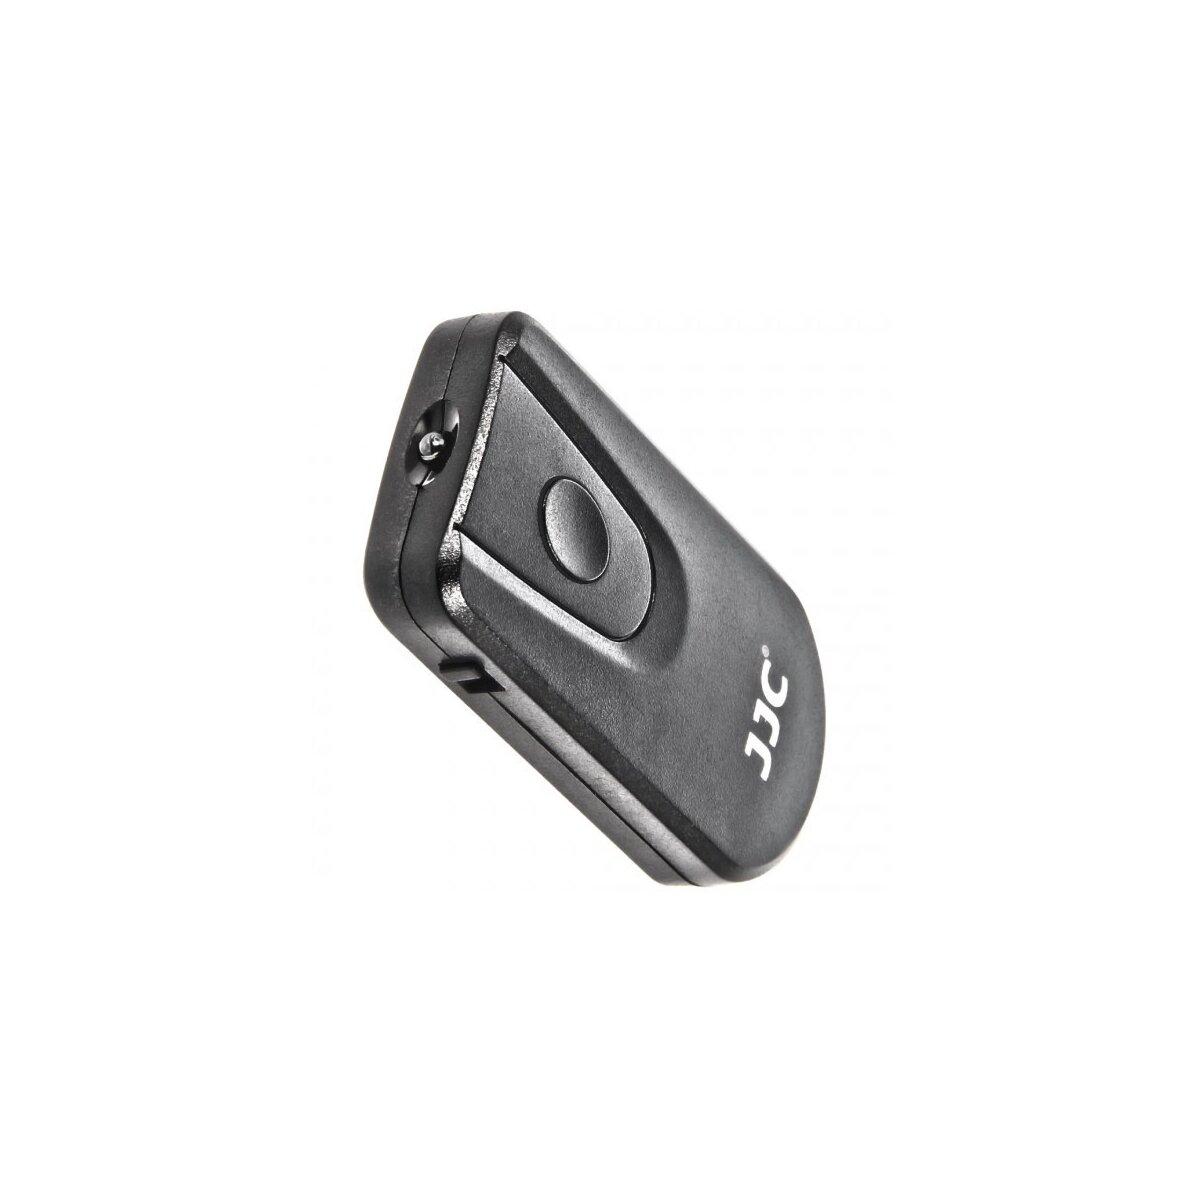 JJC IS-S1 Infrarot Fernauslöser kompatibel für Sony A6000 A900 A700 A580 A560 A550 A500 A450 A390 A380 A330 A290 A230 A7II A7 A7R A7S A99 A77II A77 A65 A57 A55 A33 NEX: 7, 6, 5T, 5R, 5N, 5